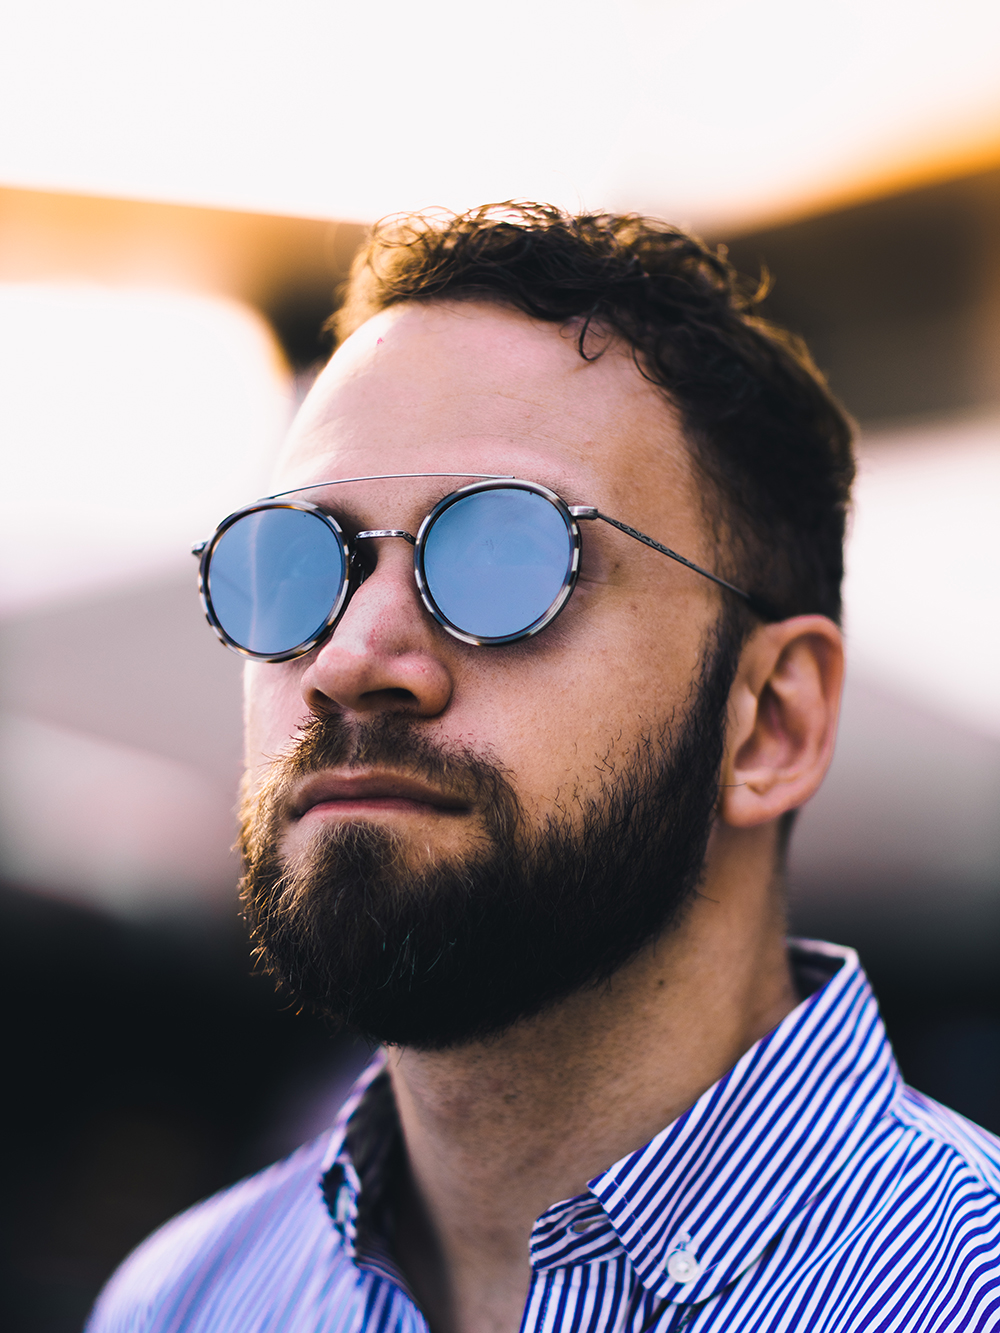 masunaga-lunettes-soleil